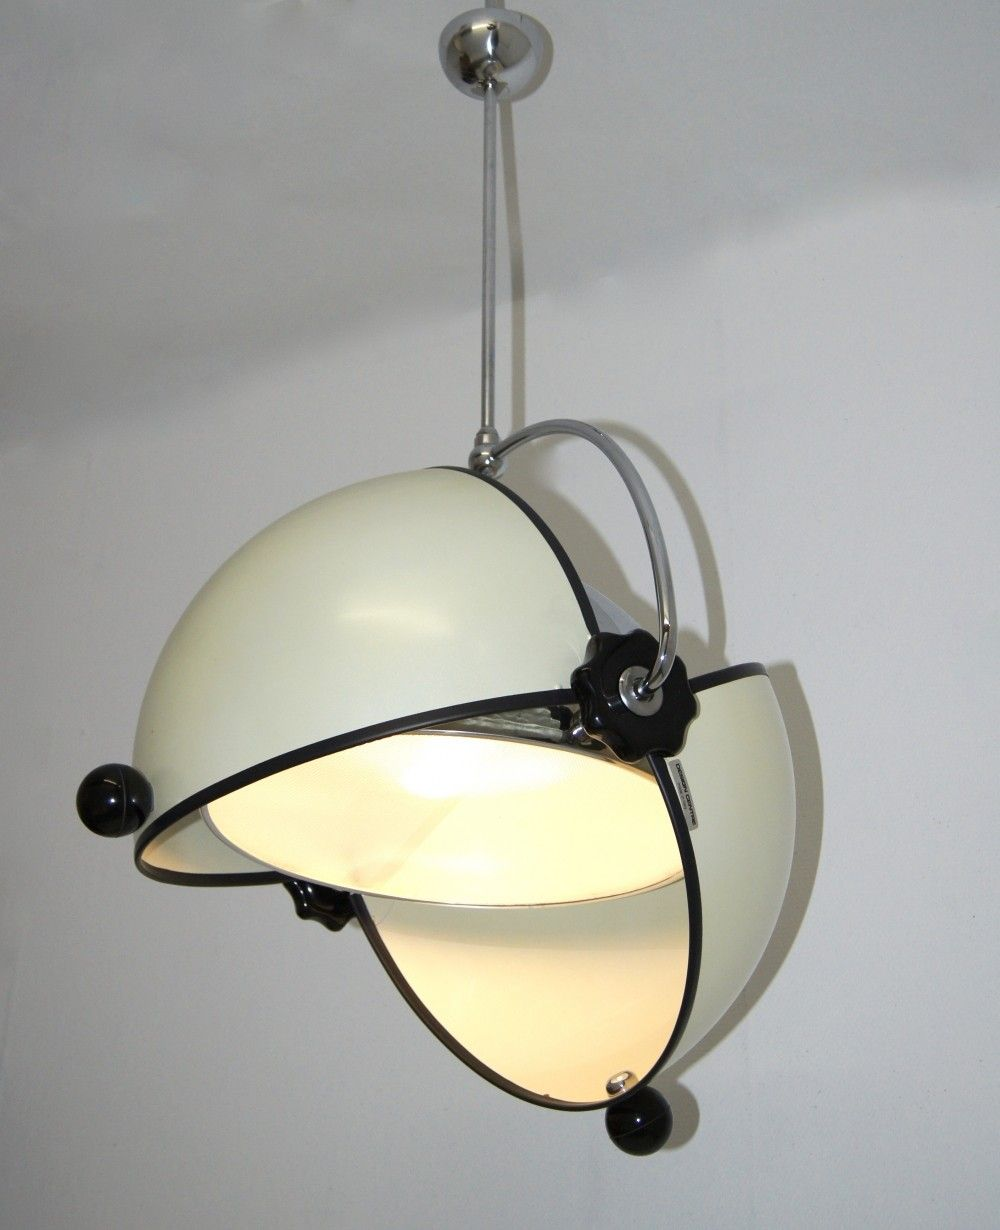 Olook or molok lamp superstudio for poltronova design for Superstudio arredamento